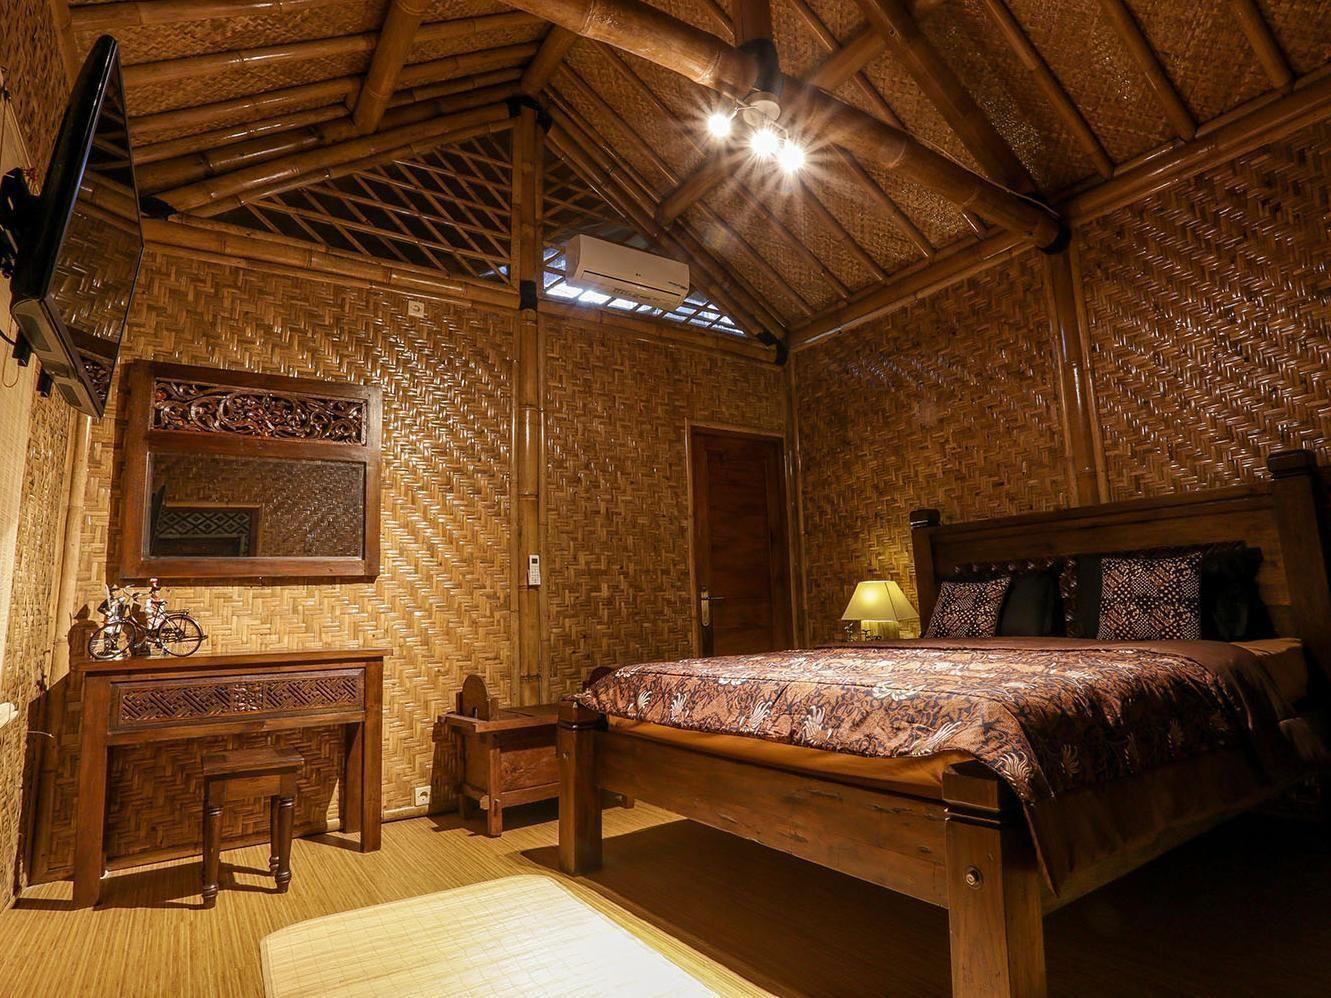 Omah Kecebong Guest House Yogyakarta, Indonesia (With